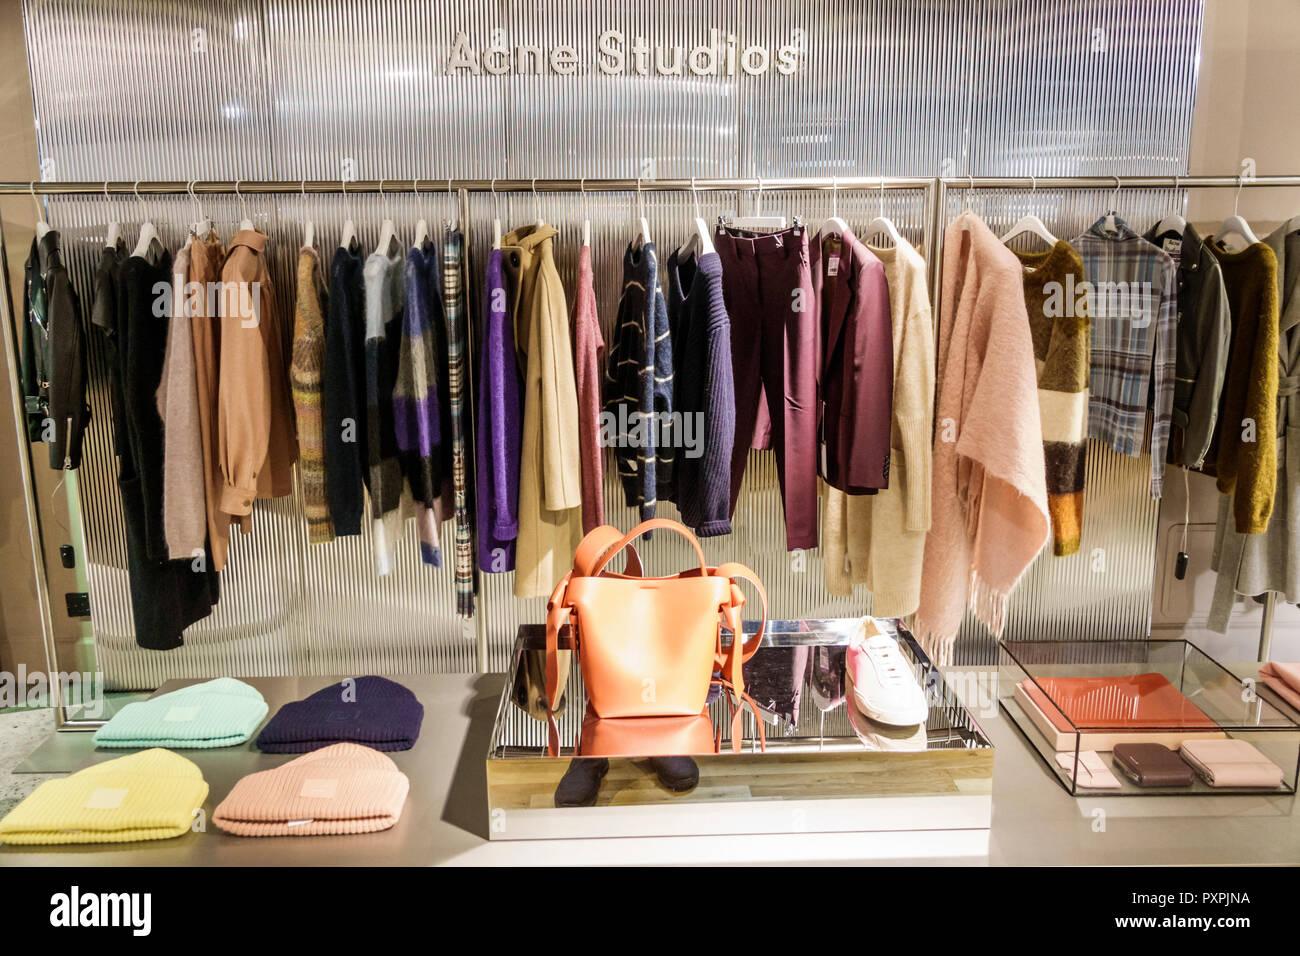 c136fbe8a75 London England United Kingdom Great Britain Soho Liberty Department Store  shopping luxury brands upmarket women s clothing